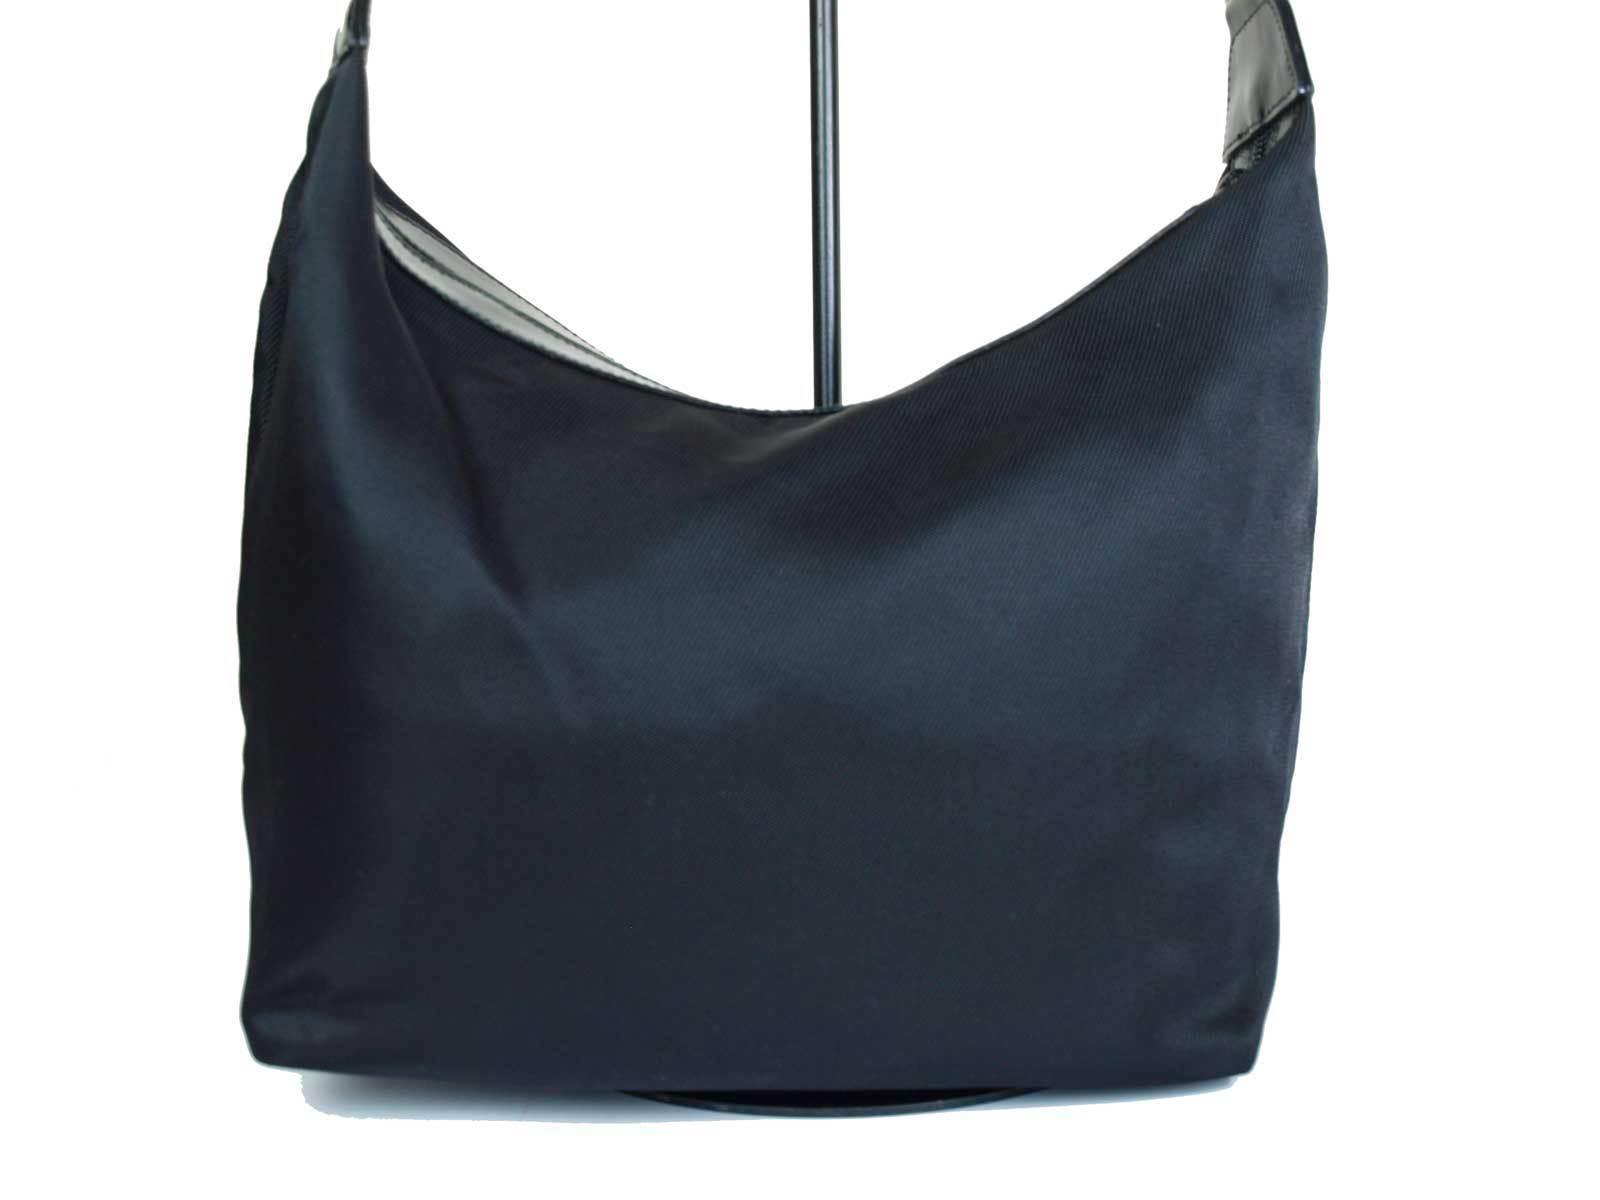 Auth GUCCI Bamboo Nylon Canvas Black Shoulder Bag GS14804L